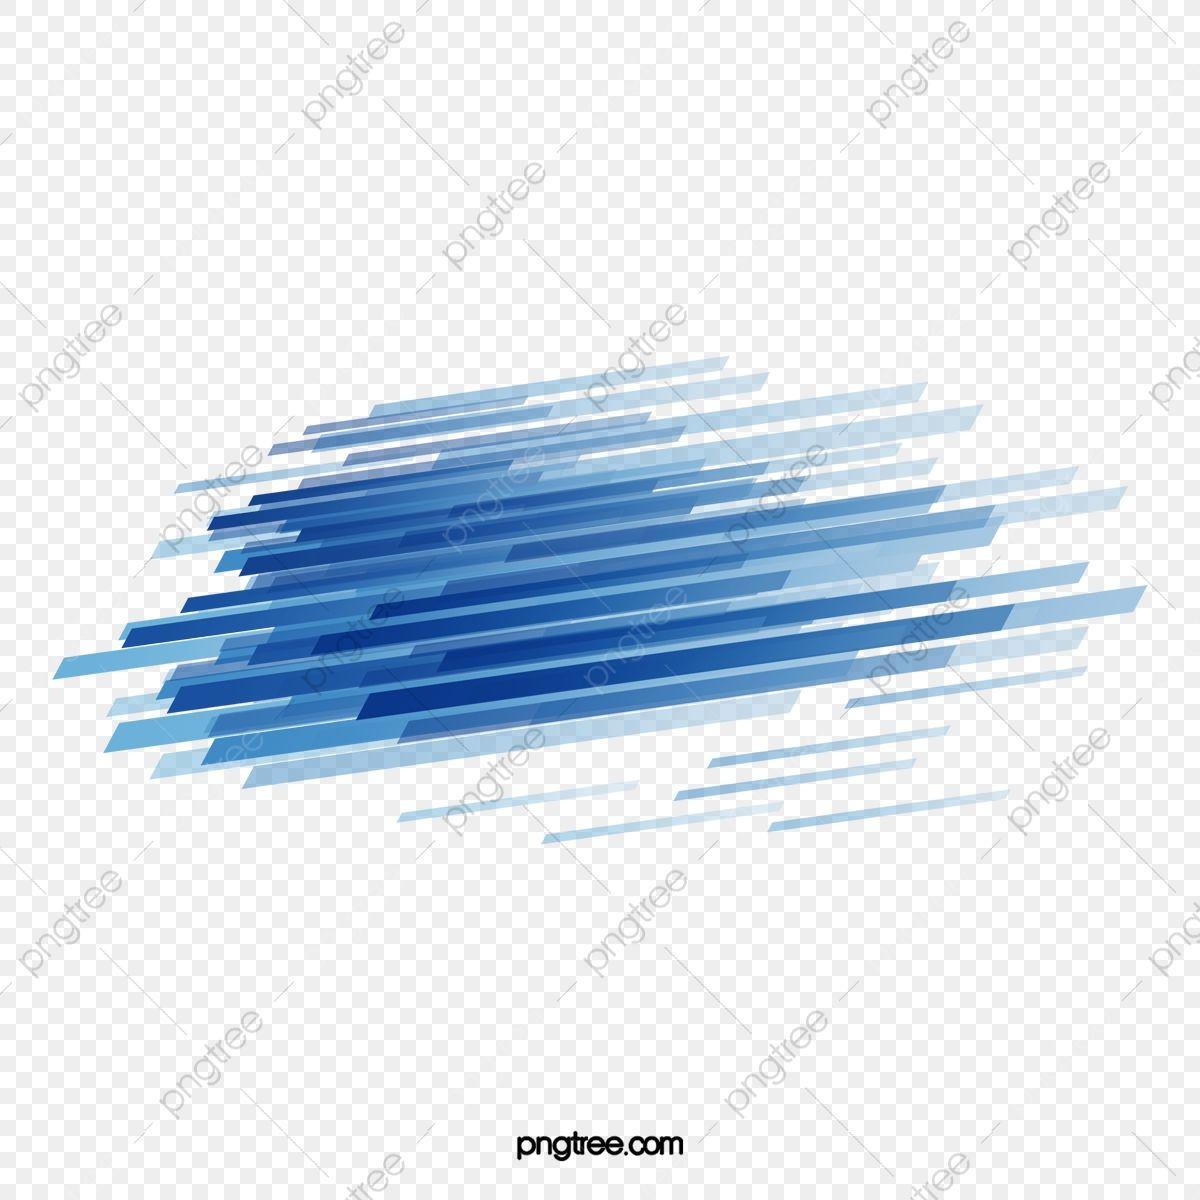 Ciencia E Abstrato Azul Ciencia E Resumo Vetor De Ciencia Imagem Png E Psd Para Download Gratuito Blue Abstract Blue Abstract Painting Geometric Background